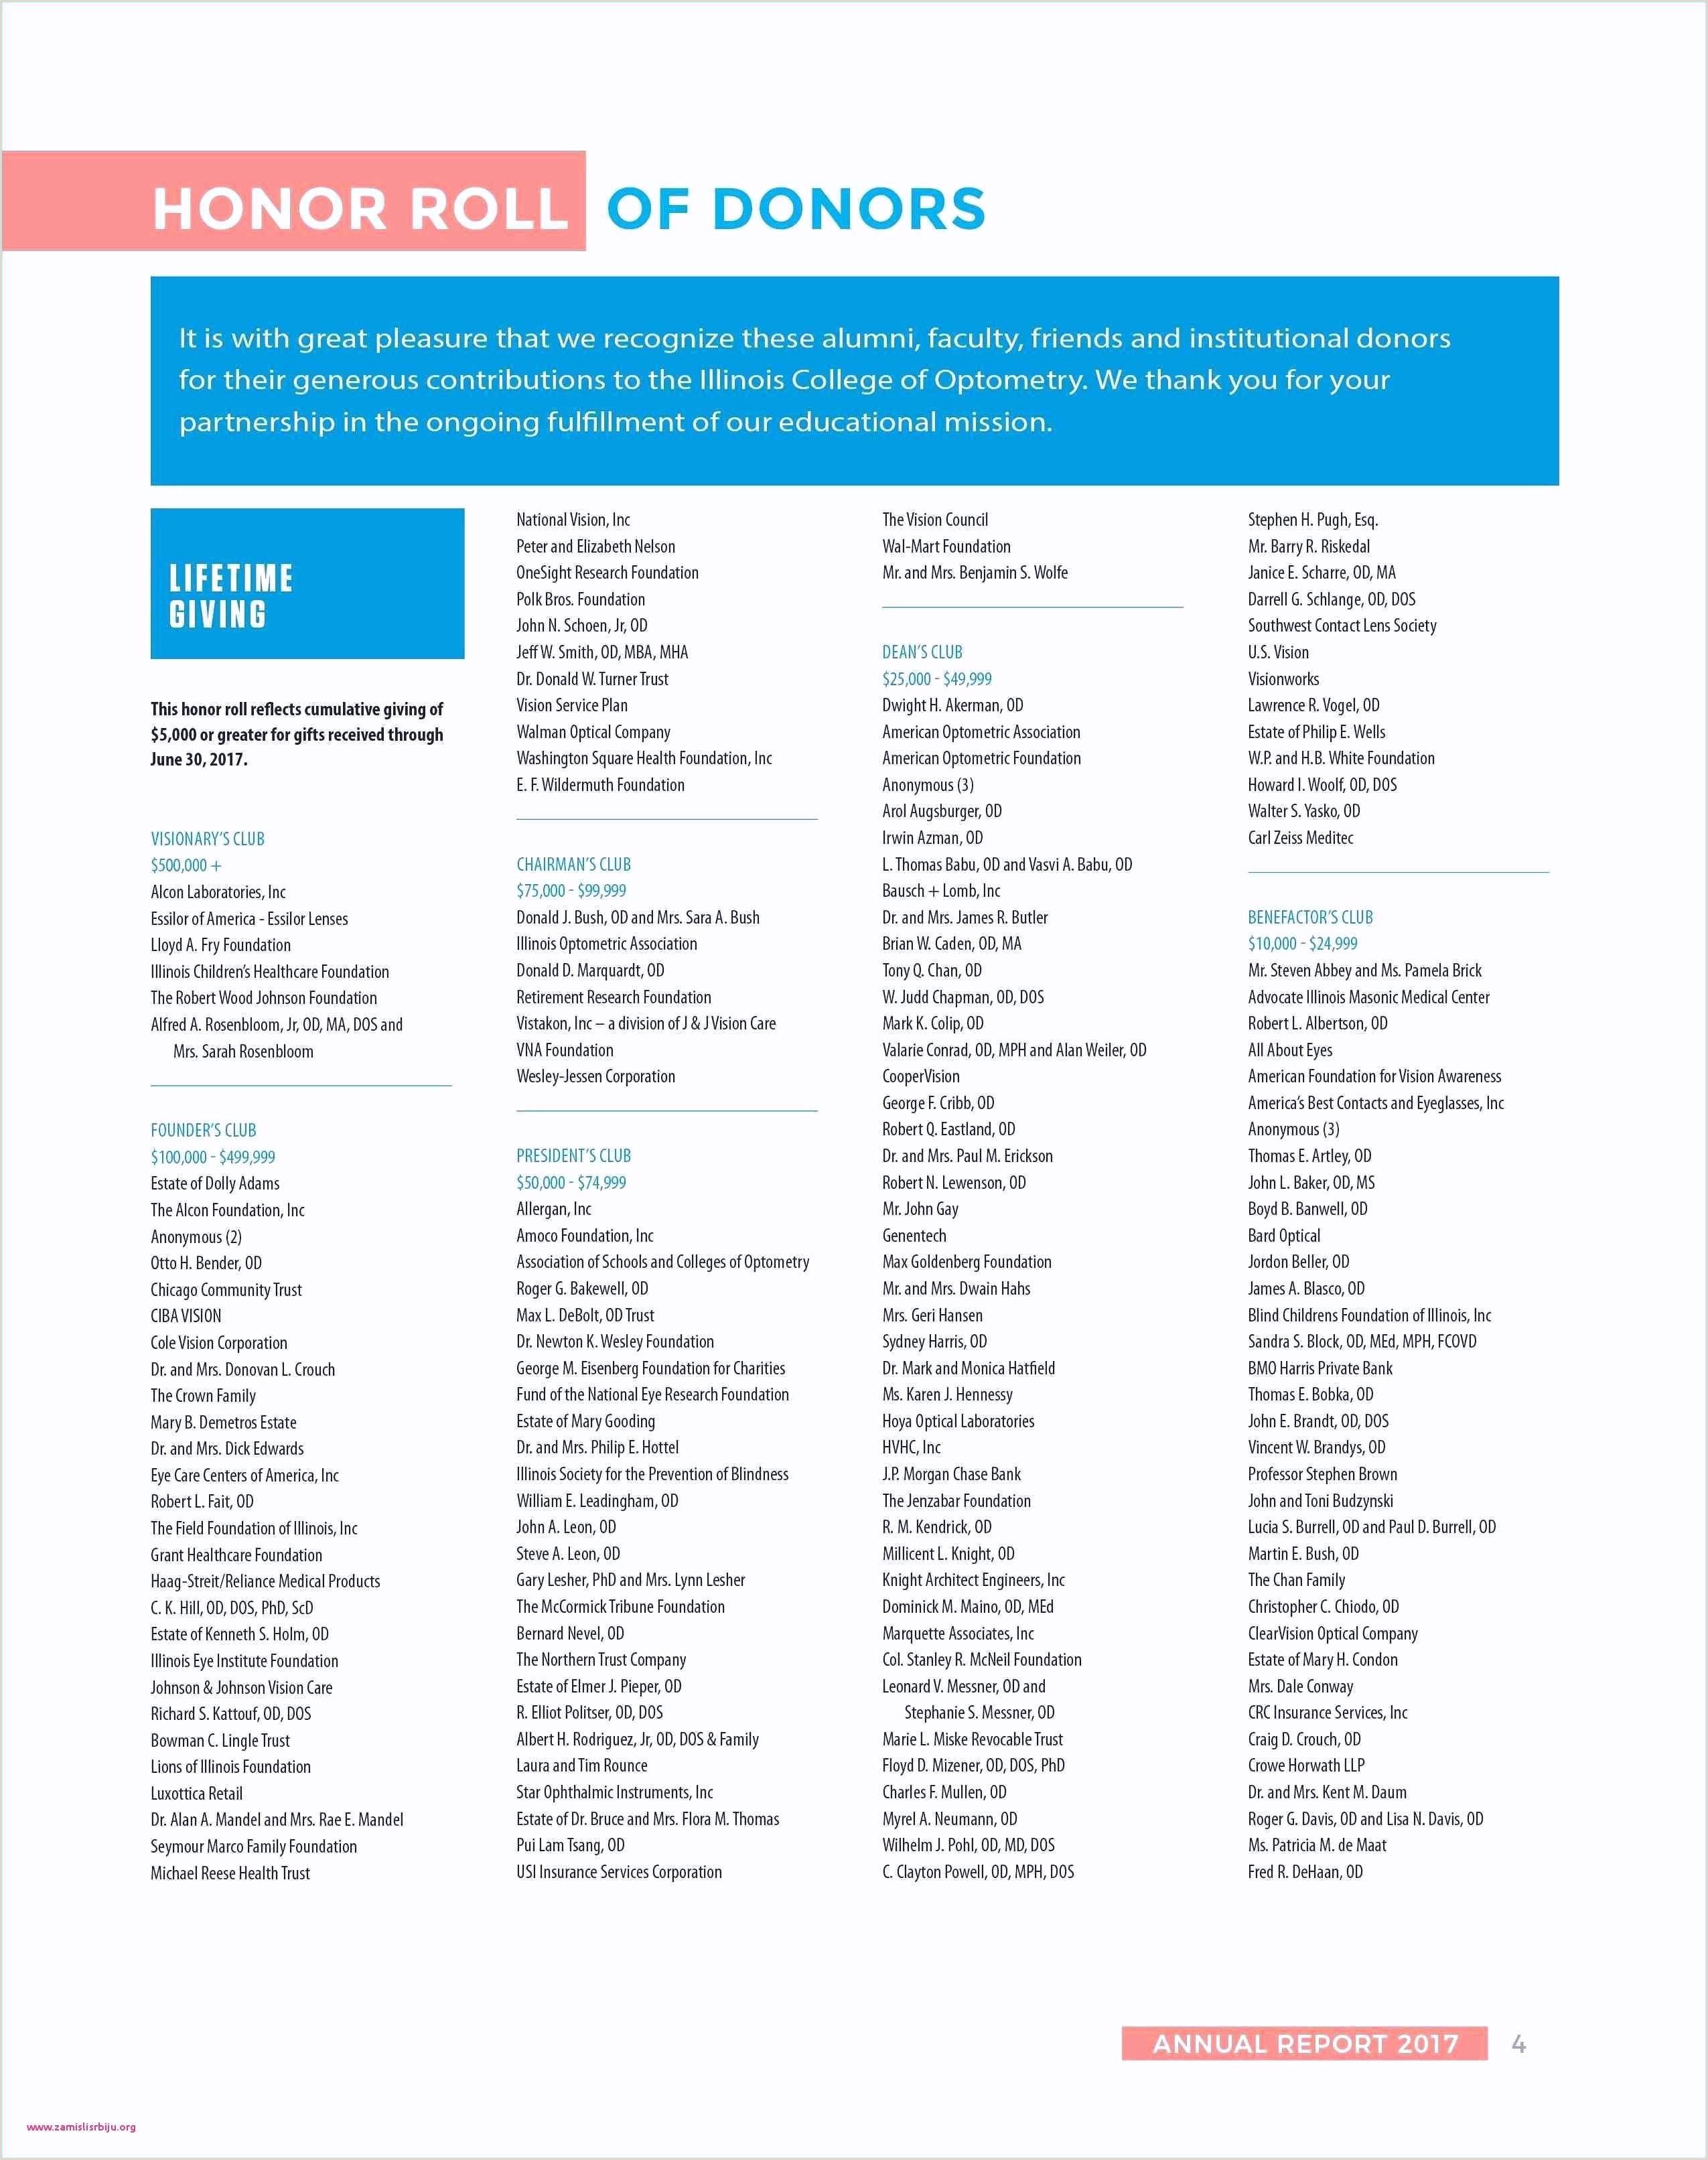 Resume Format For Job Hd Exemple De Cv Professionnel 2019 Einzigartig Modele Cv Word